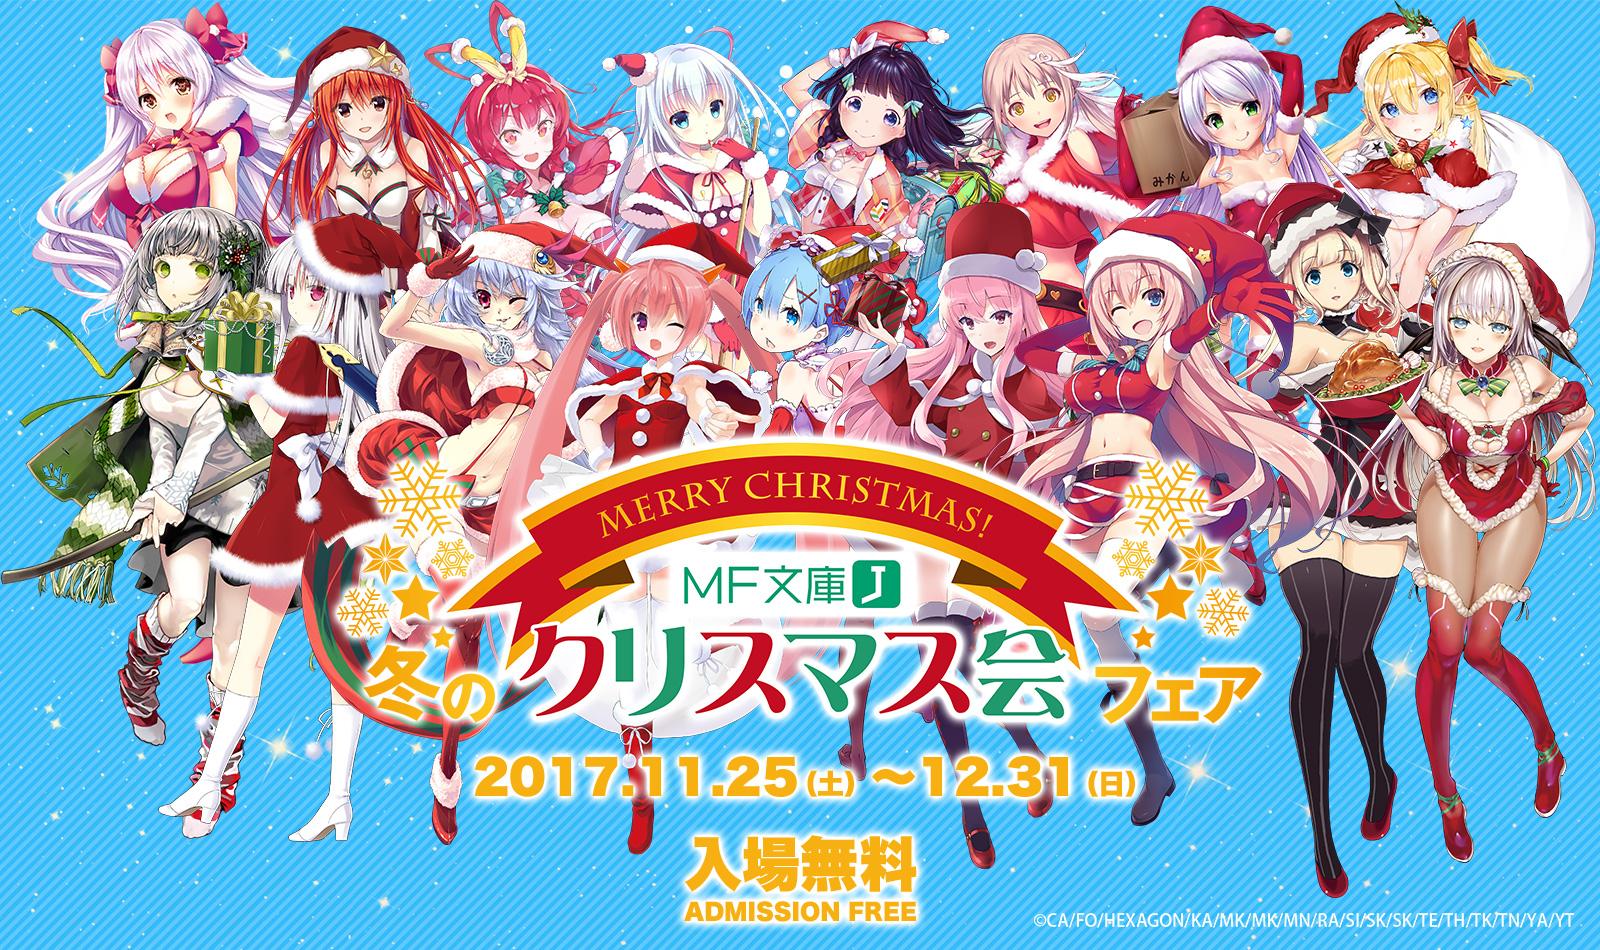 MF文庫J 冬のクリスマス会フェア